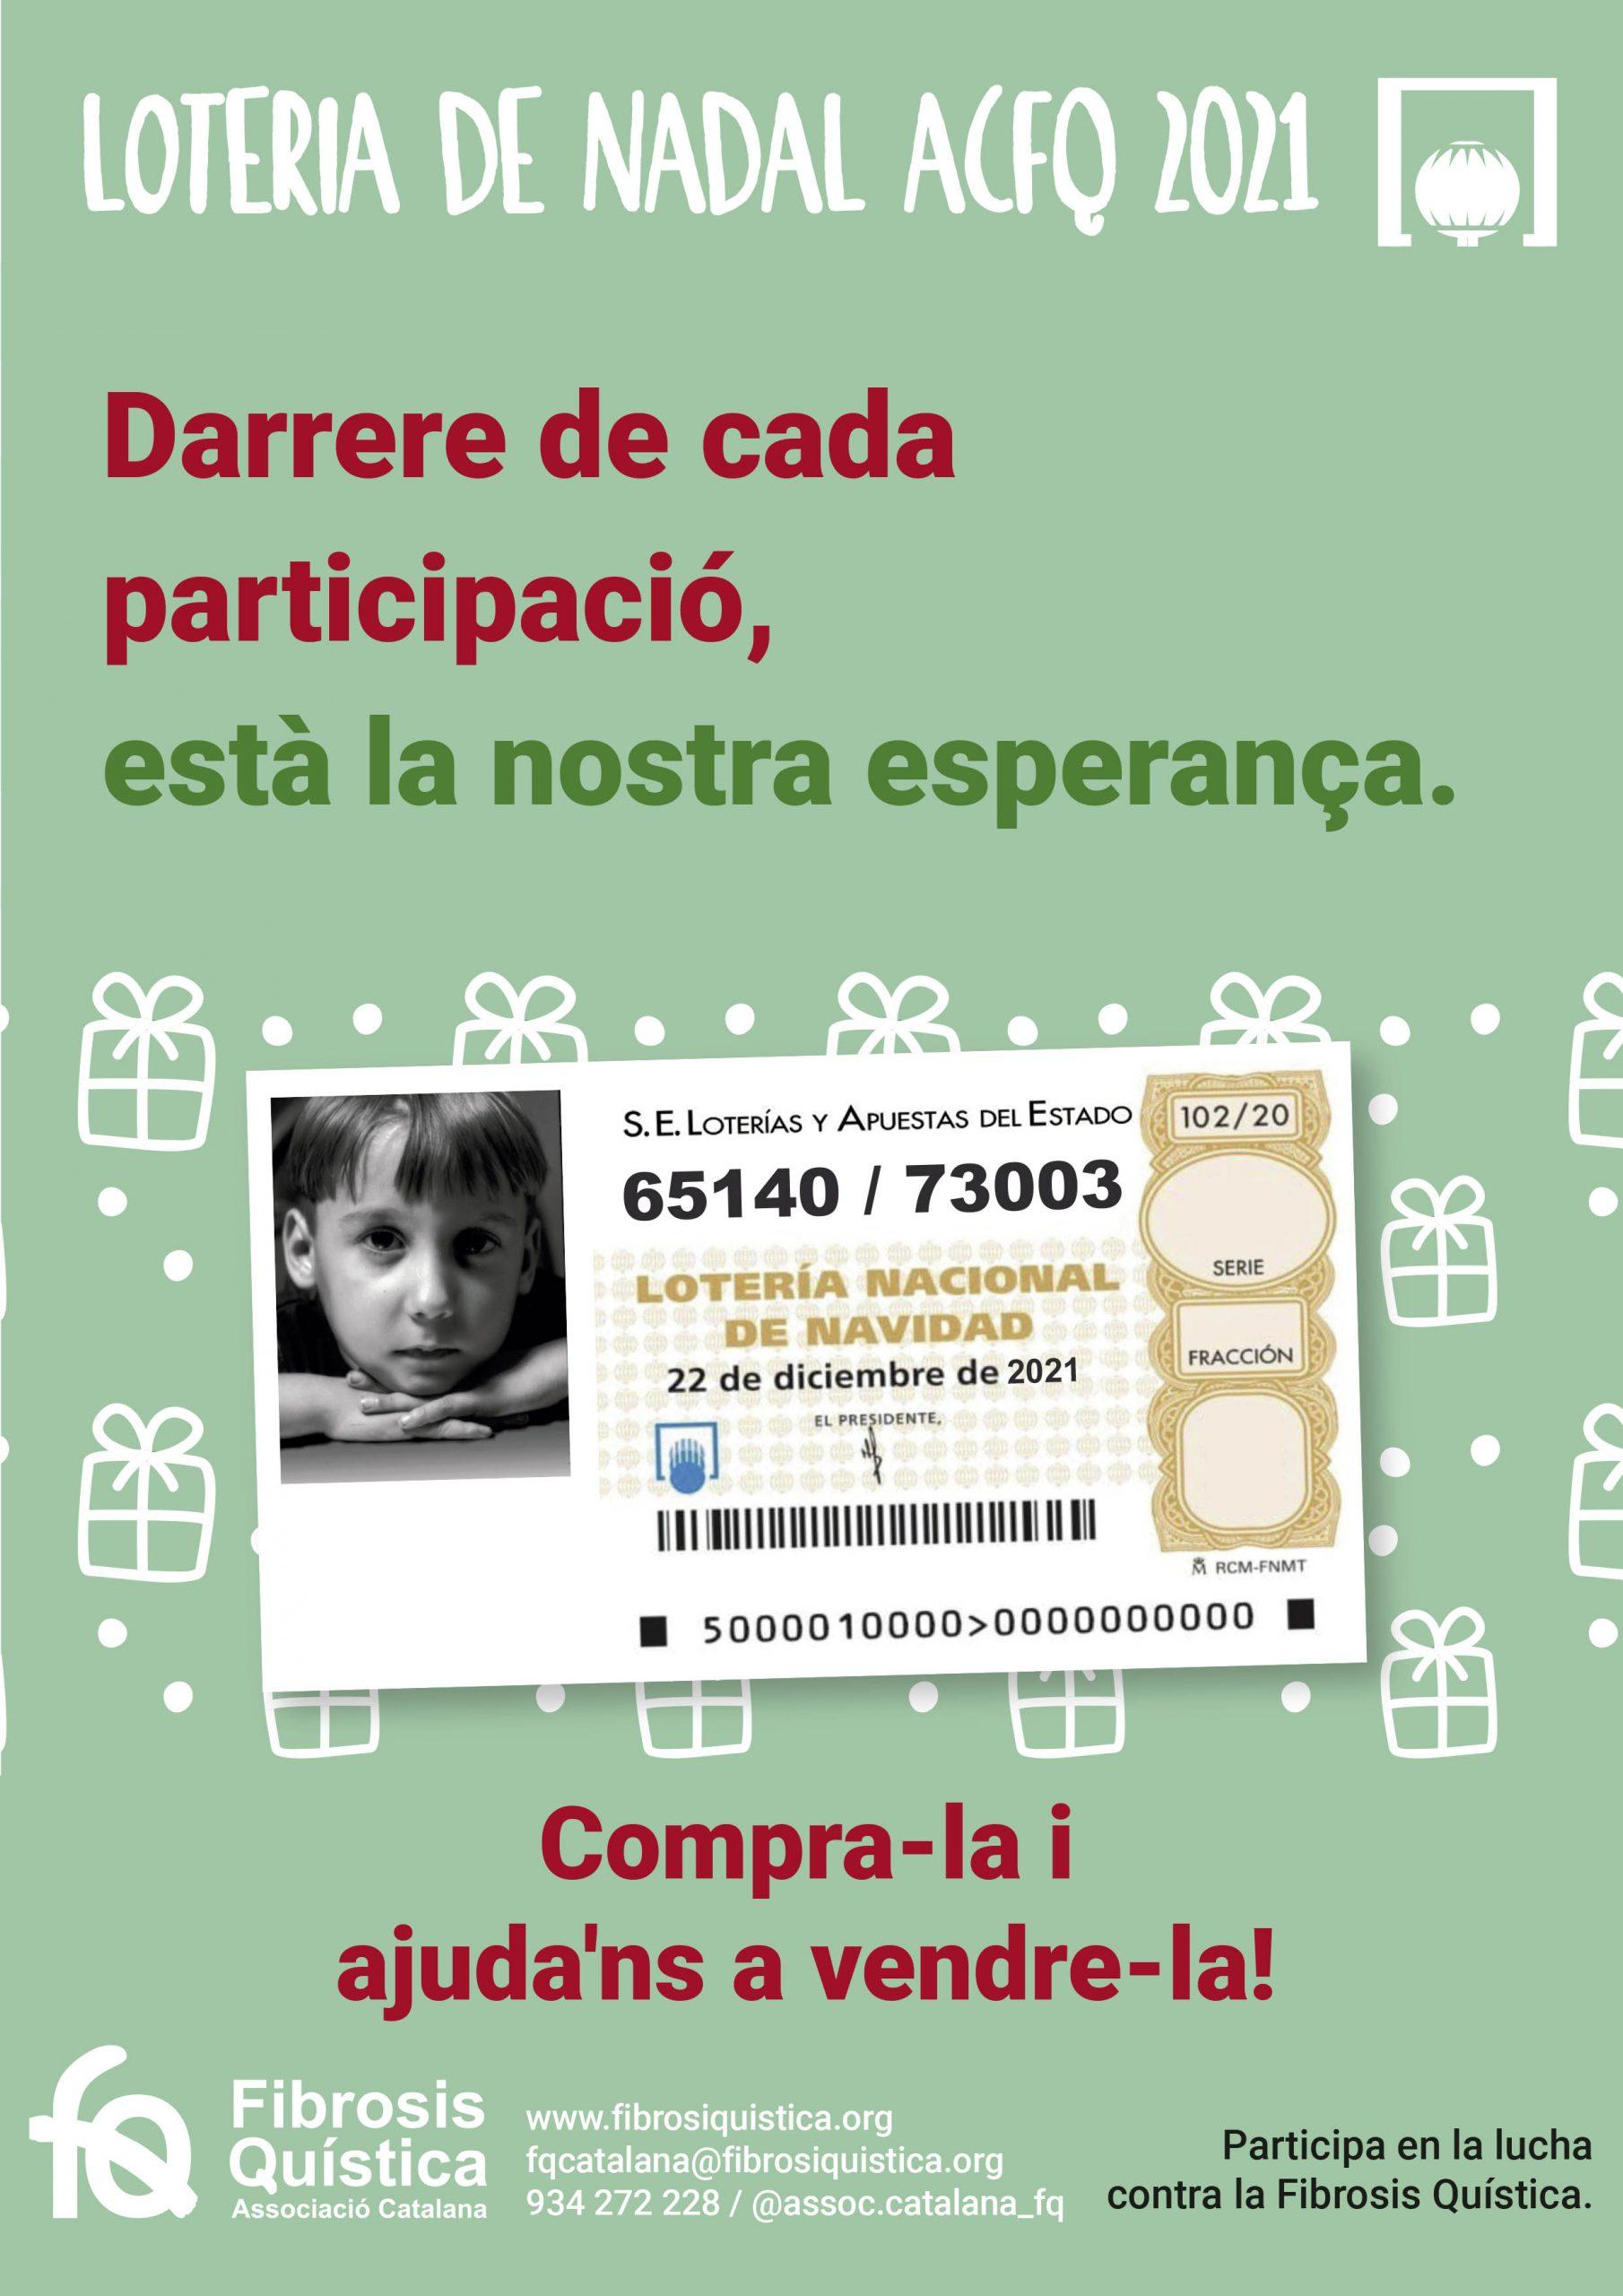 Loteria De Nadal 2021